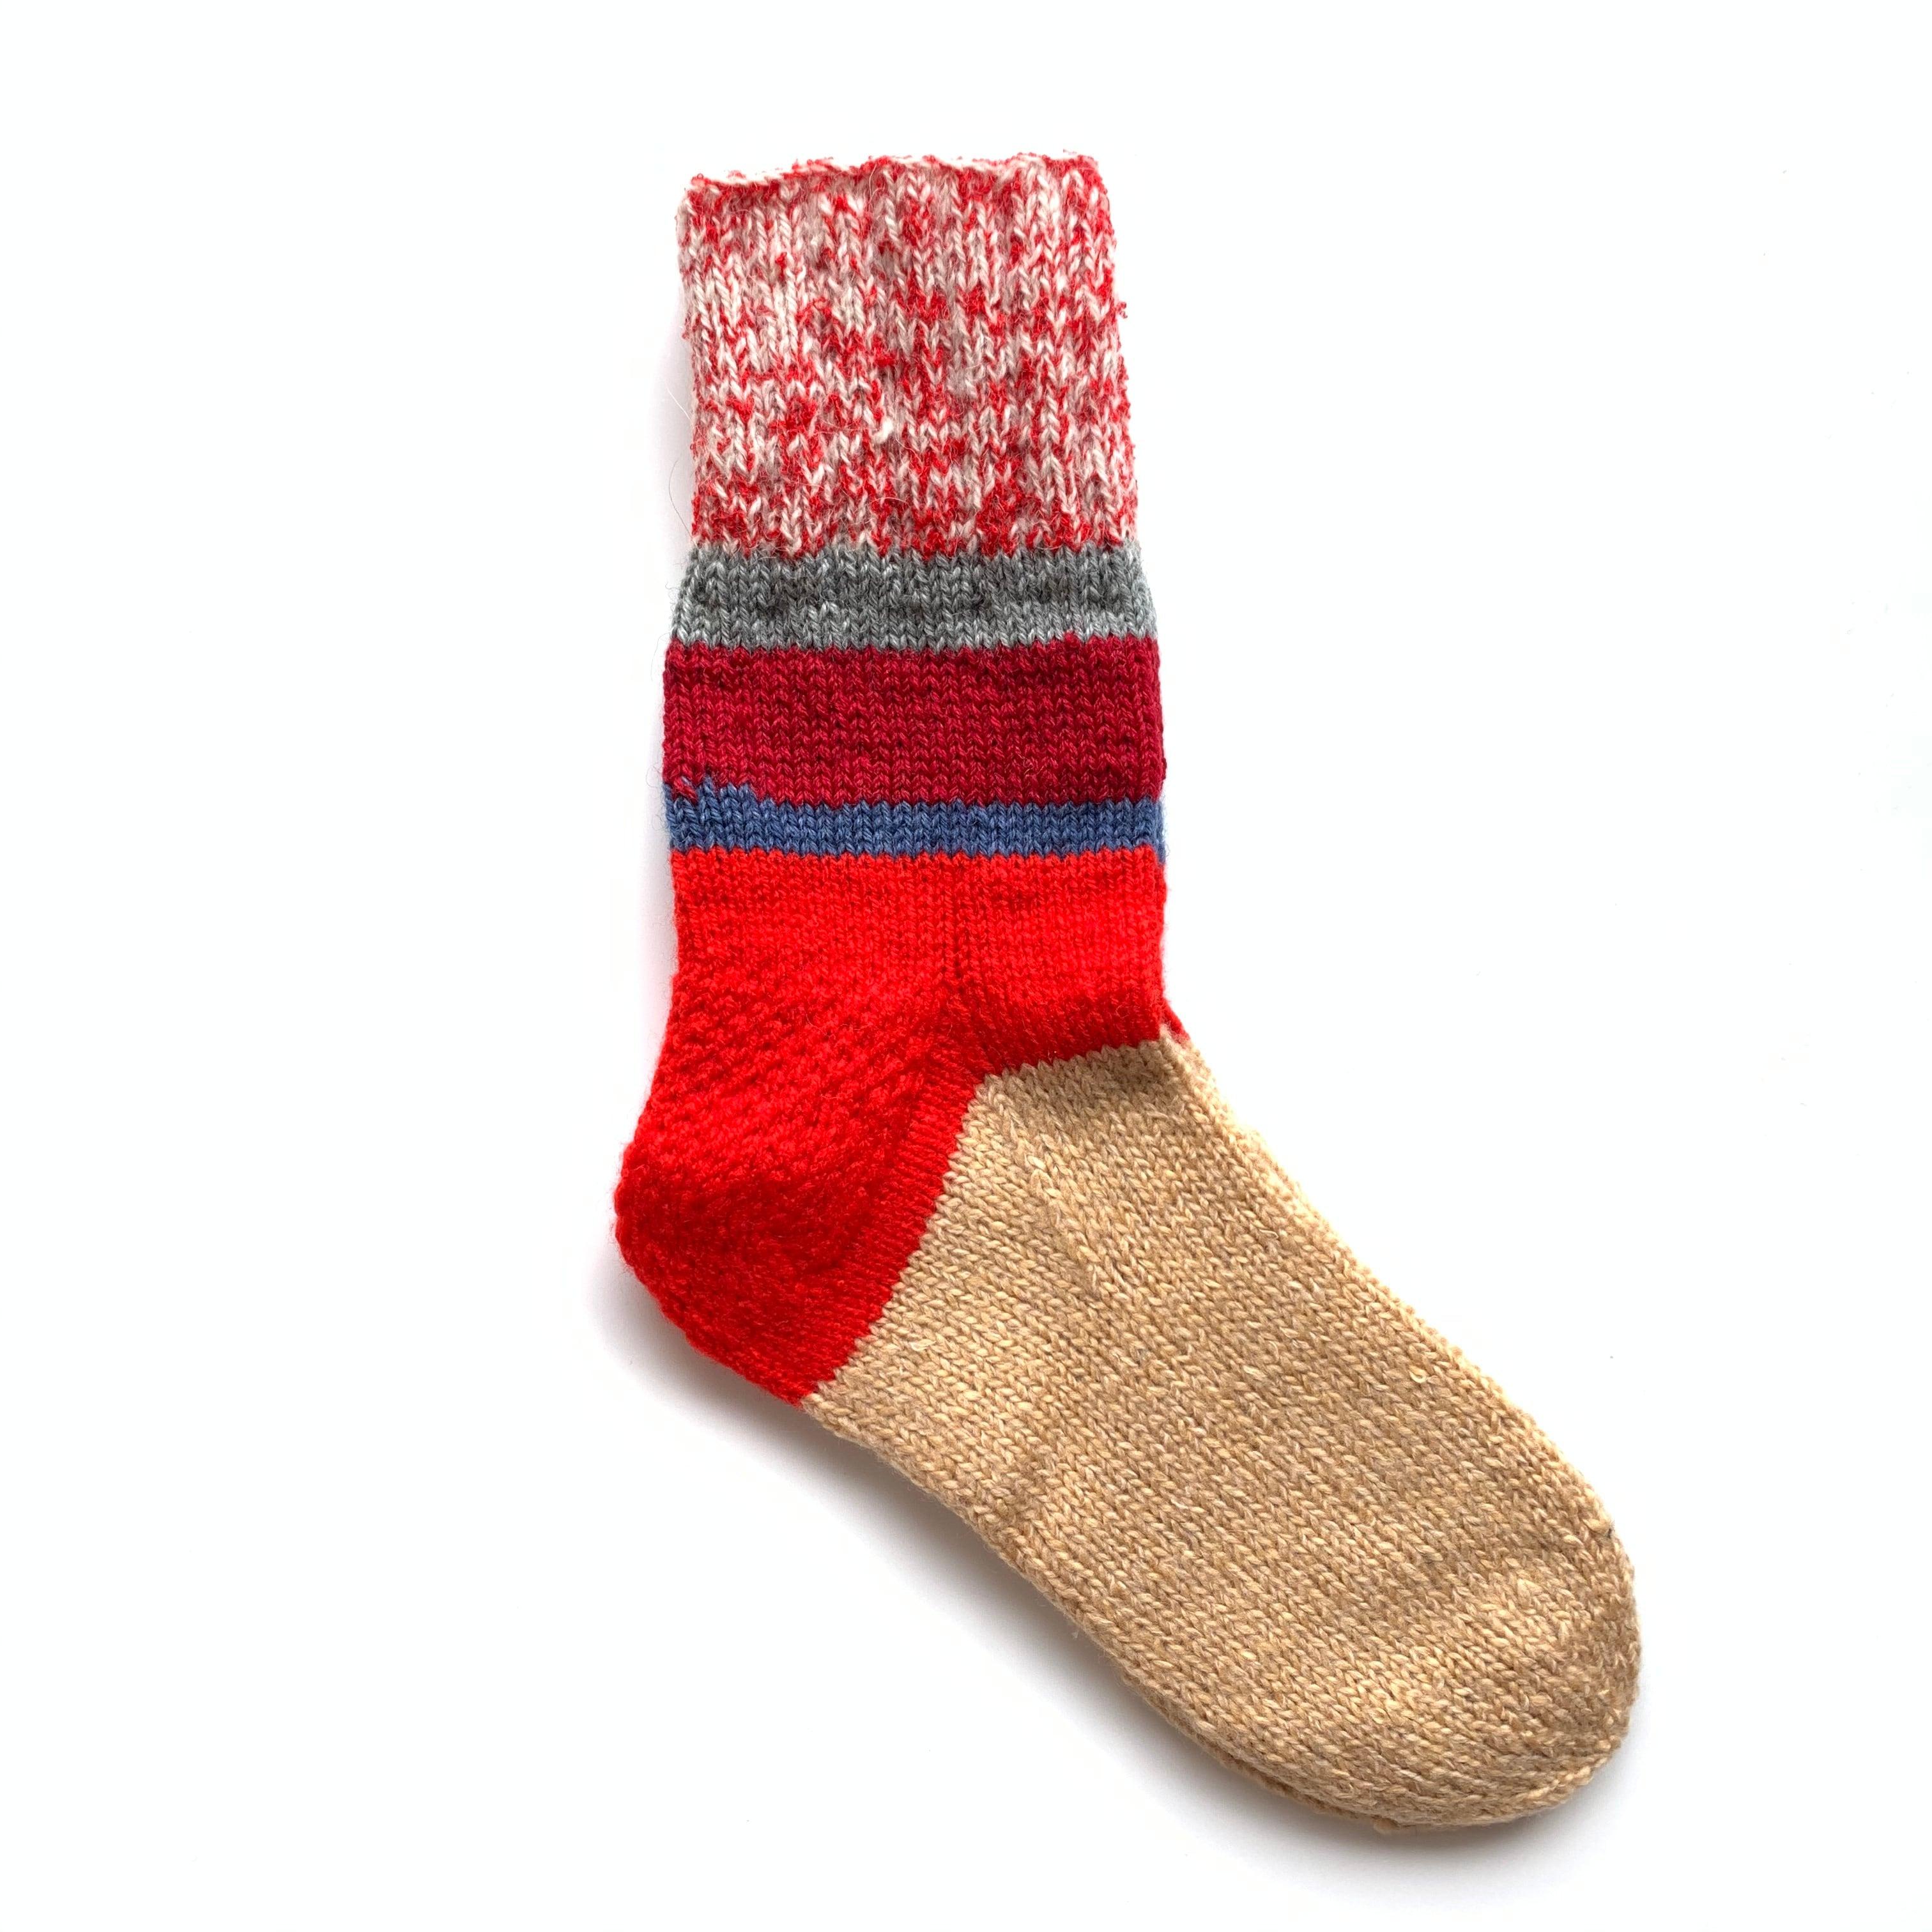 Socks[A]